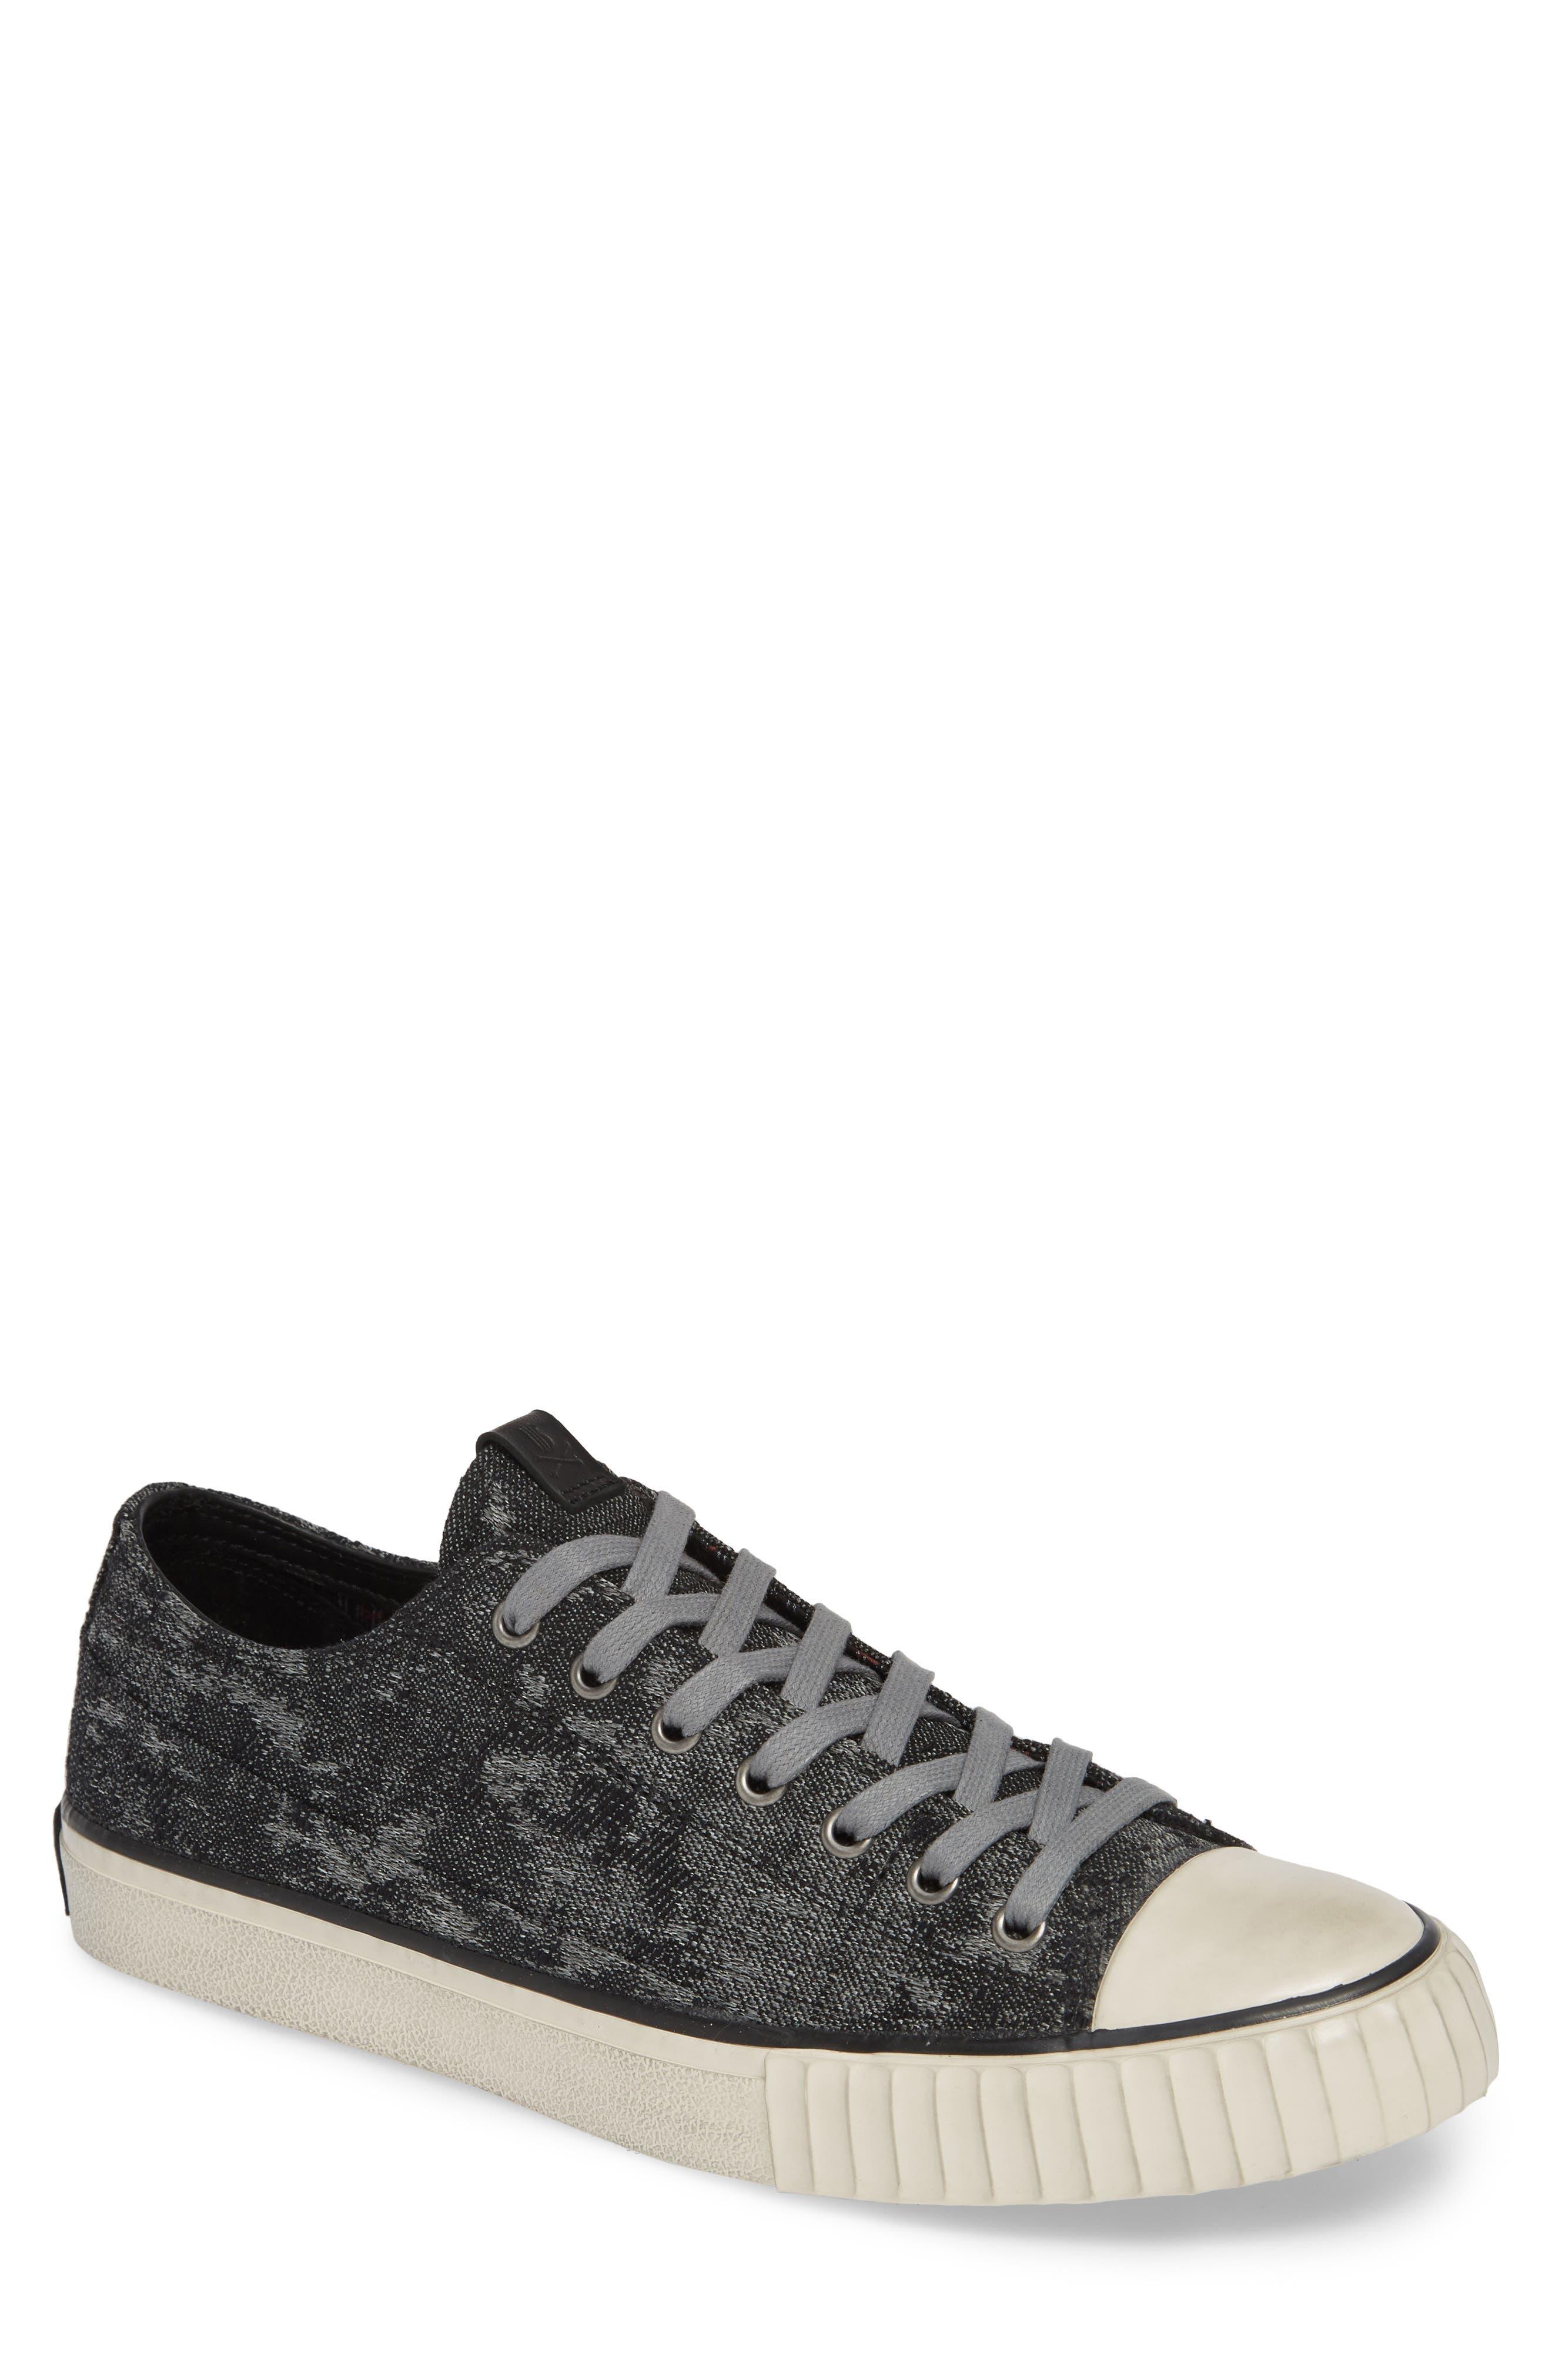 Bootleg By John Varvatos Abstract Sneaker- Grey